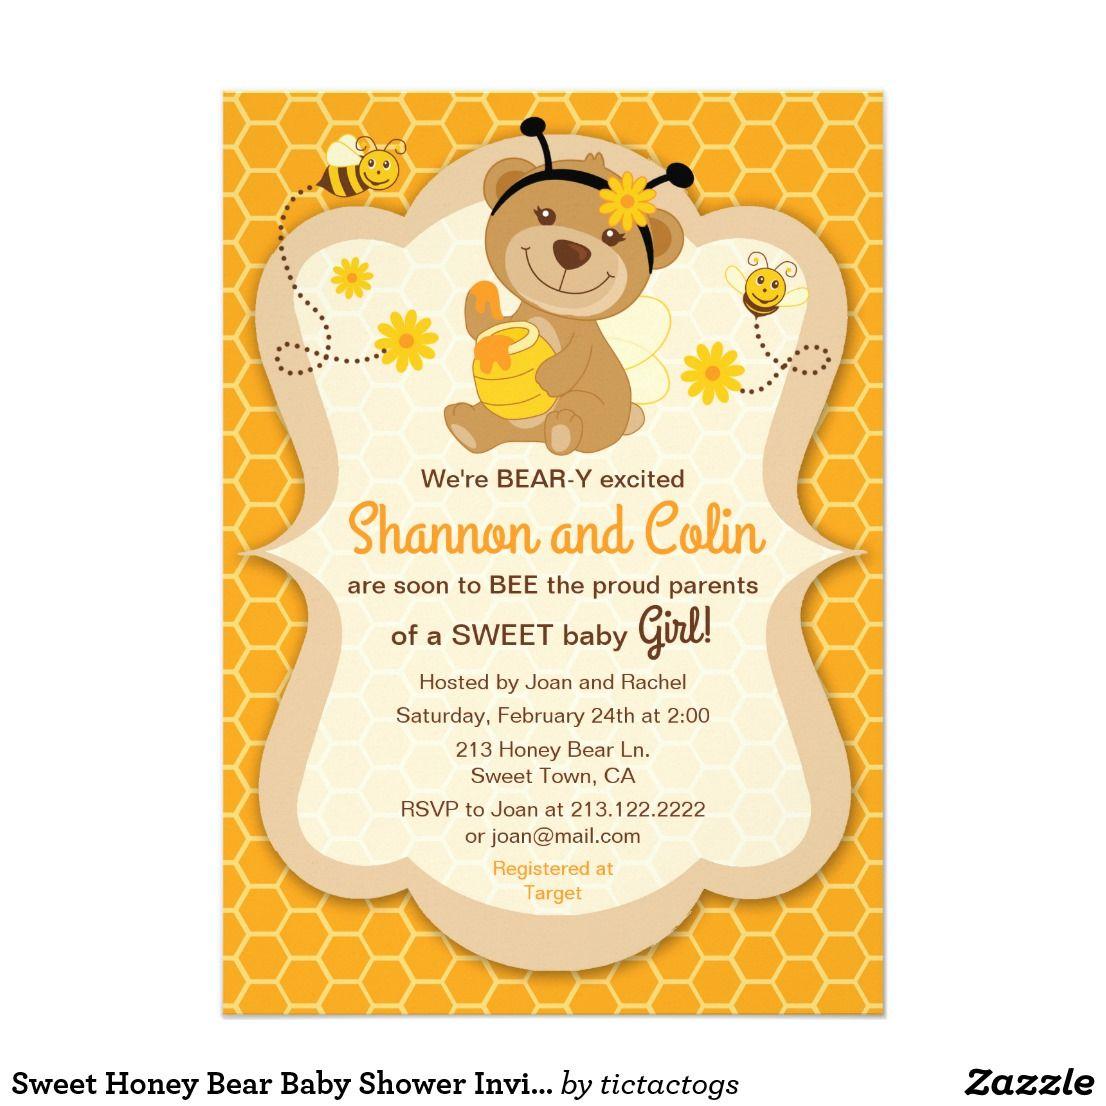 Sweet Honey Bear Baby Shower Invitation This baby shower invitation ...